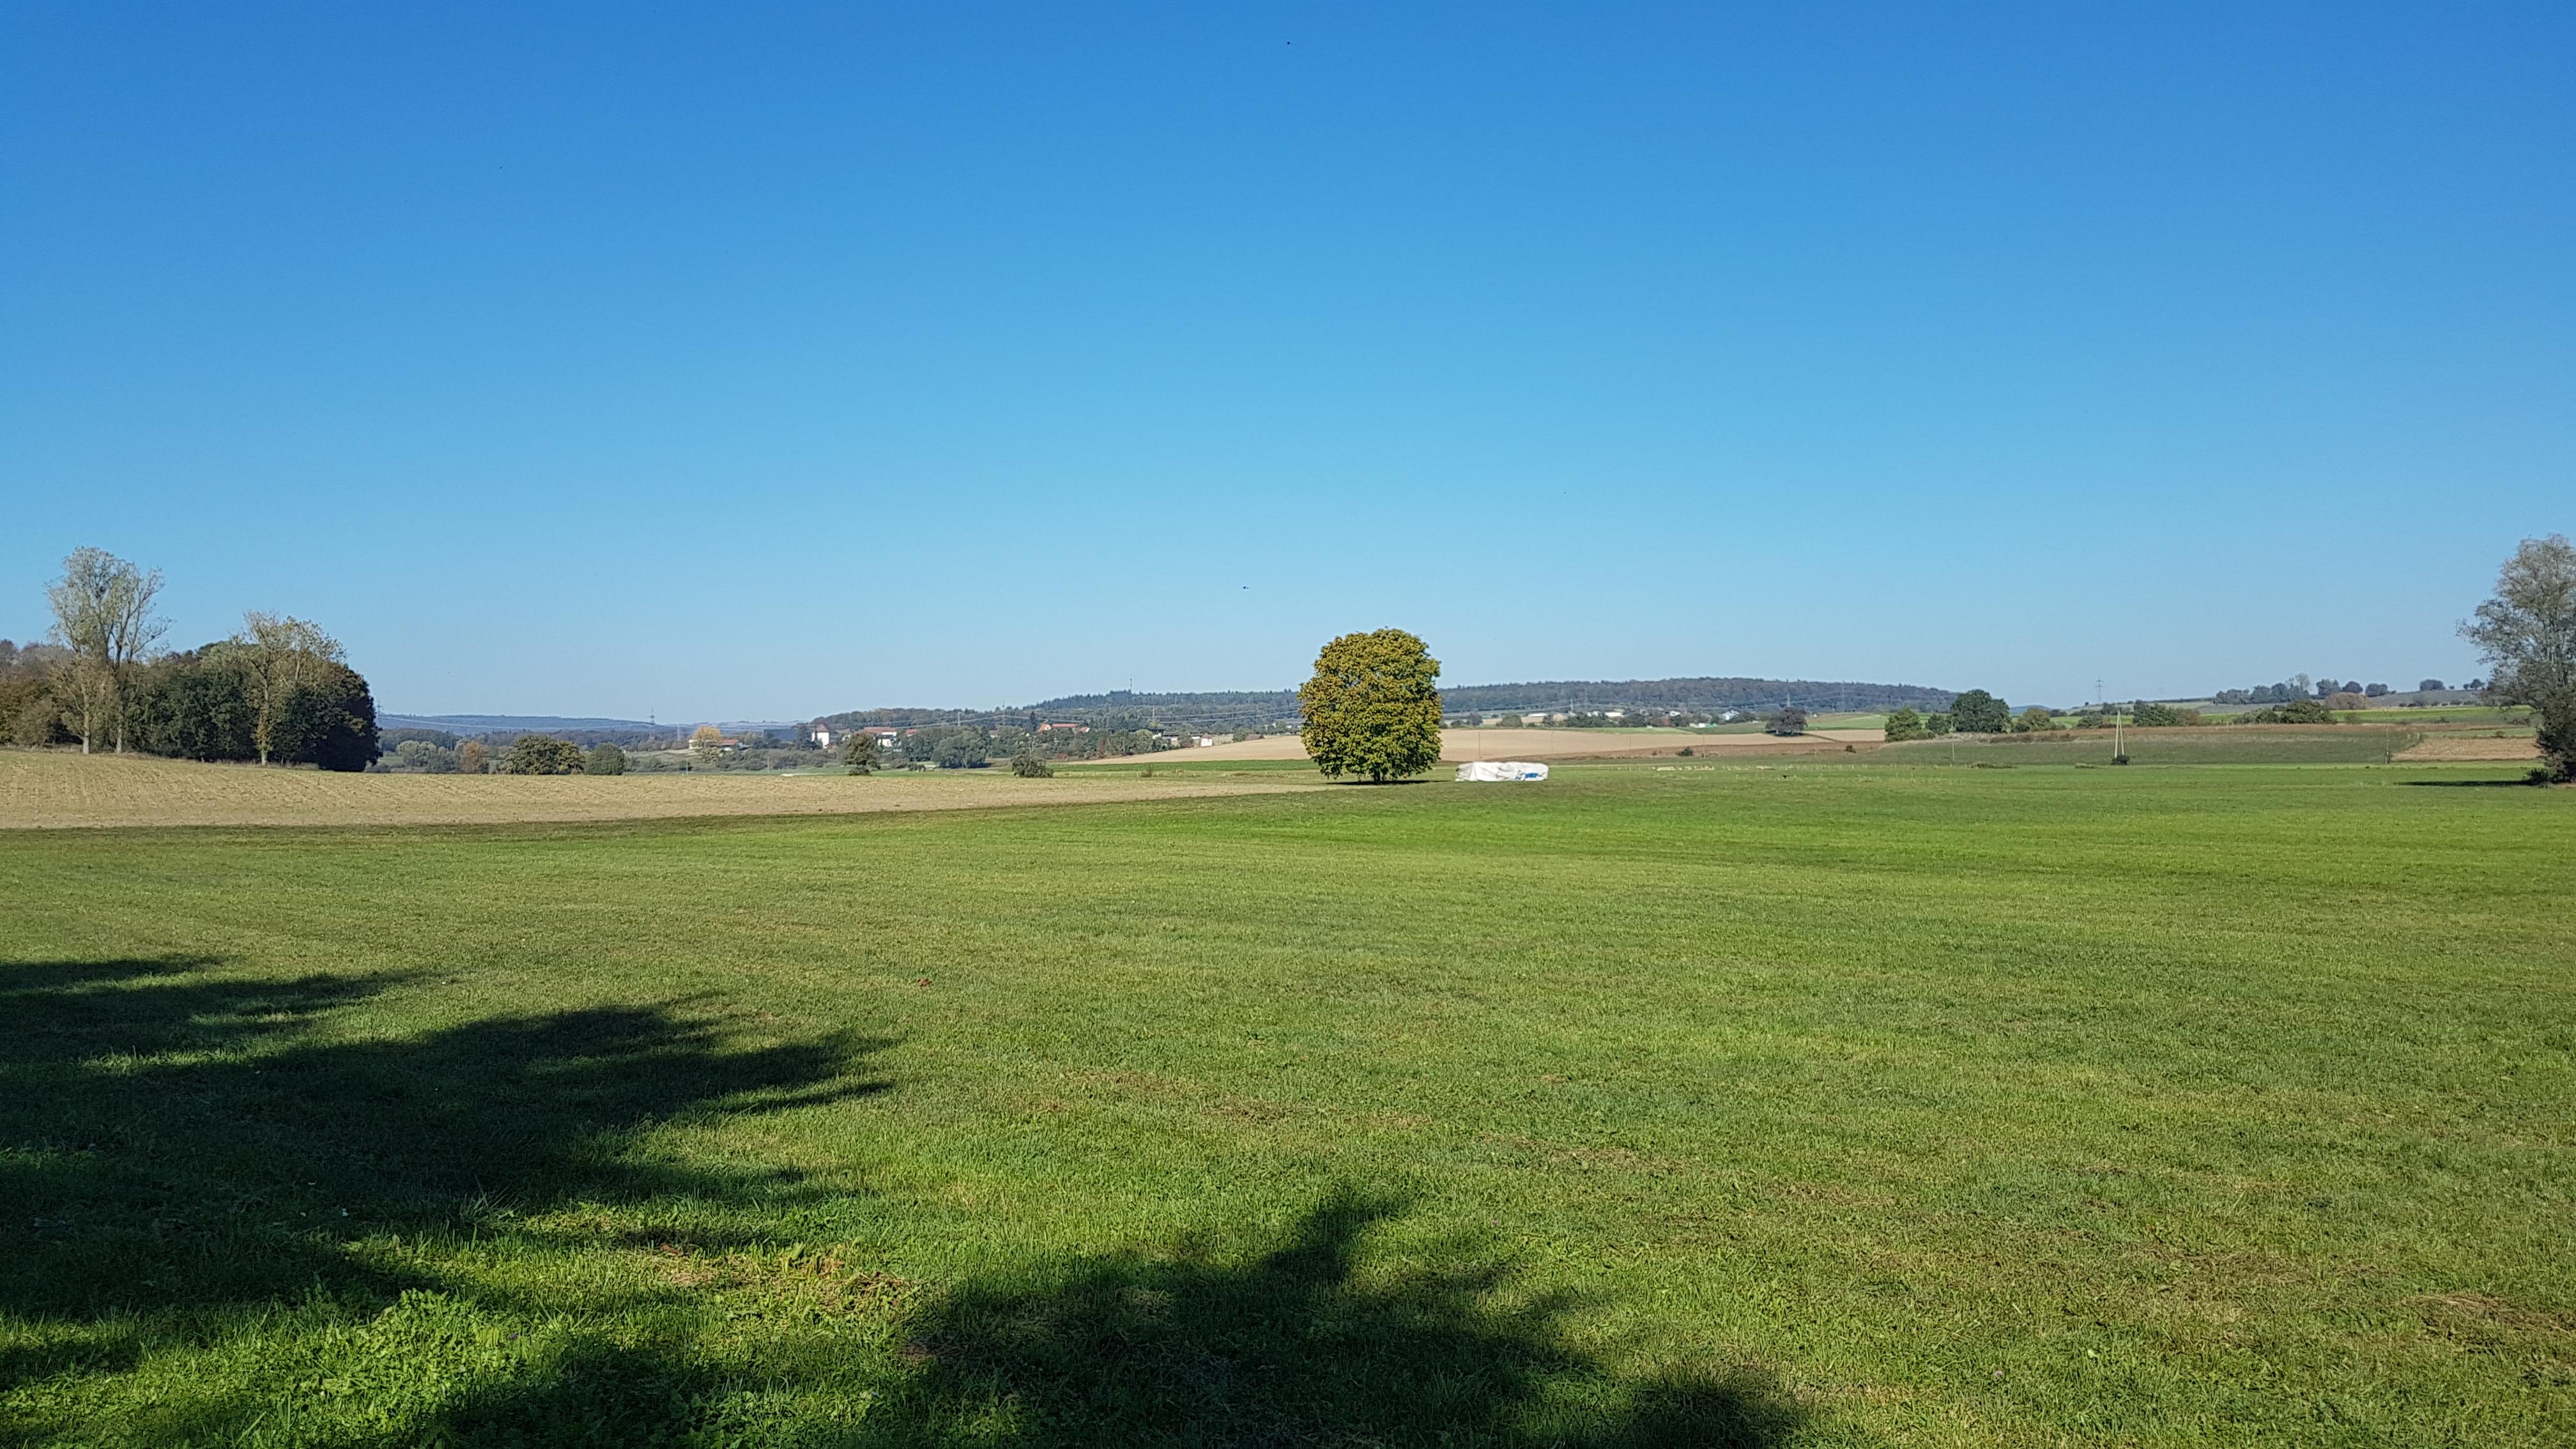 Naturschutzgebiet Weitenried mit Blick Richtung Wiechs